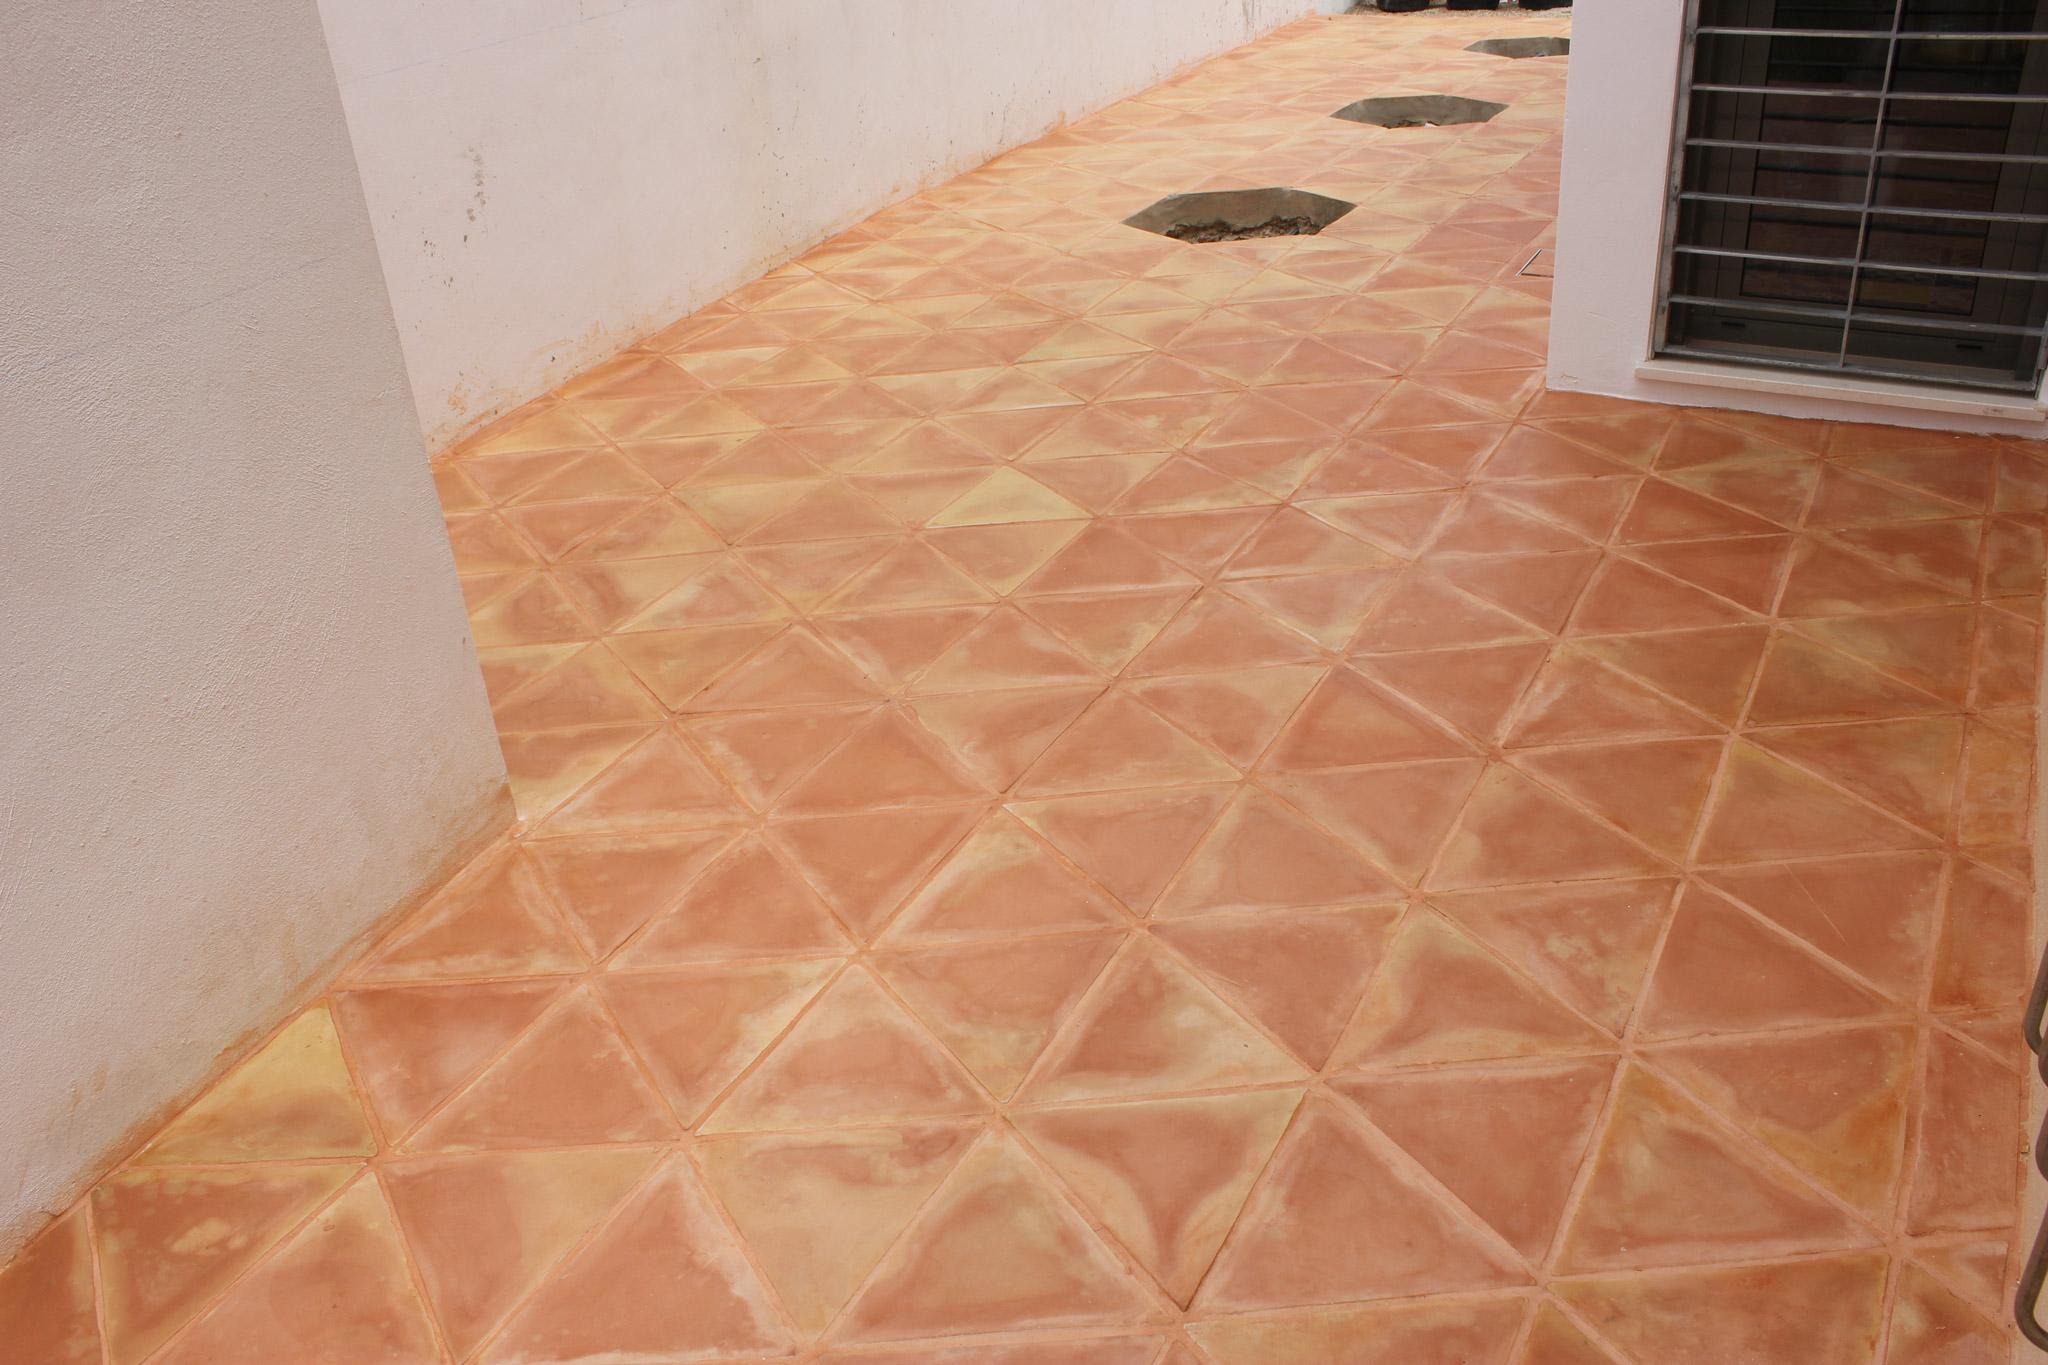 Clay Tiles Karachi Terracotta Floor Tiles in Peshawar Pakistan (6)